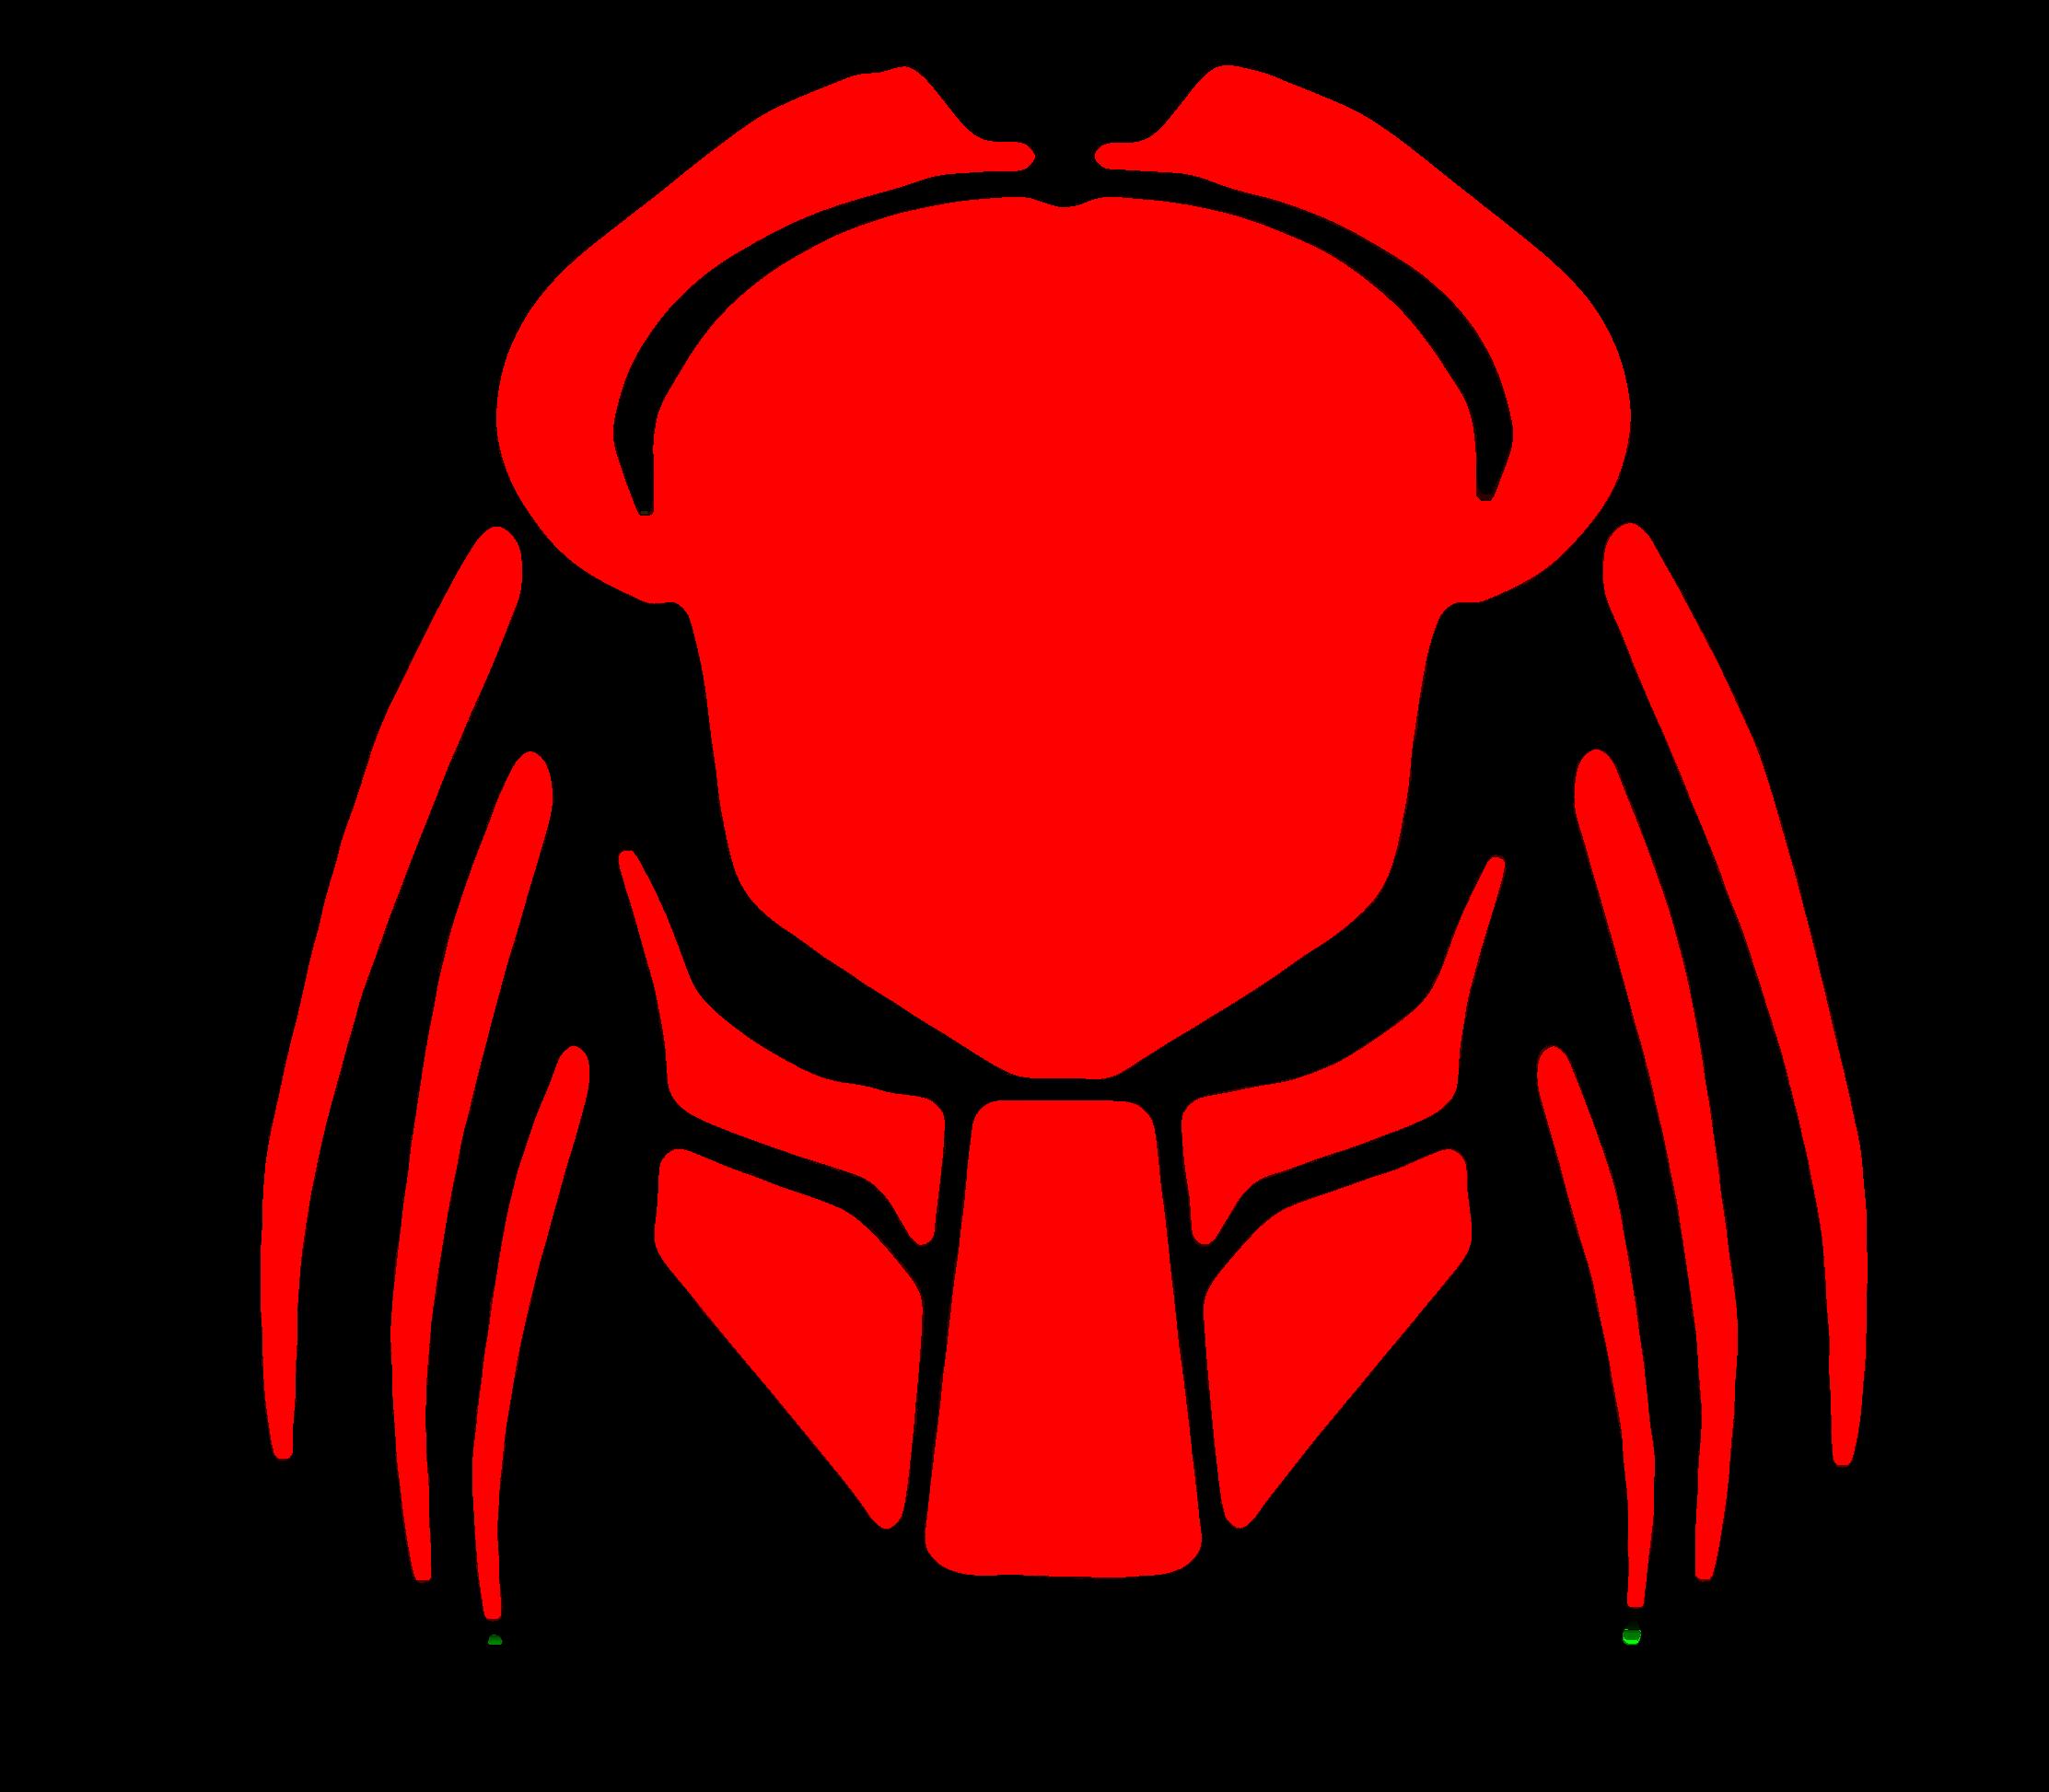 Predator clipart Red Cybergoth art  com